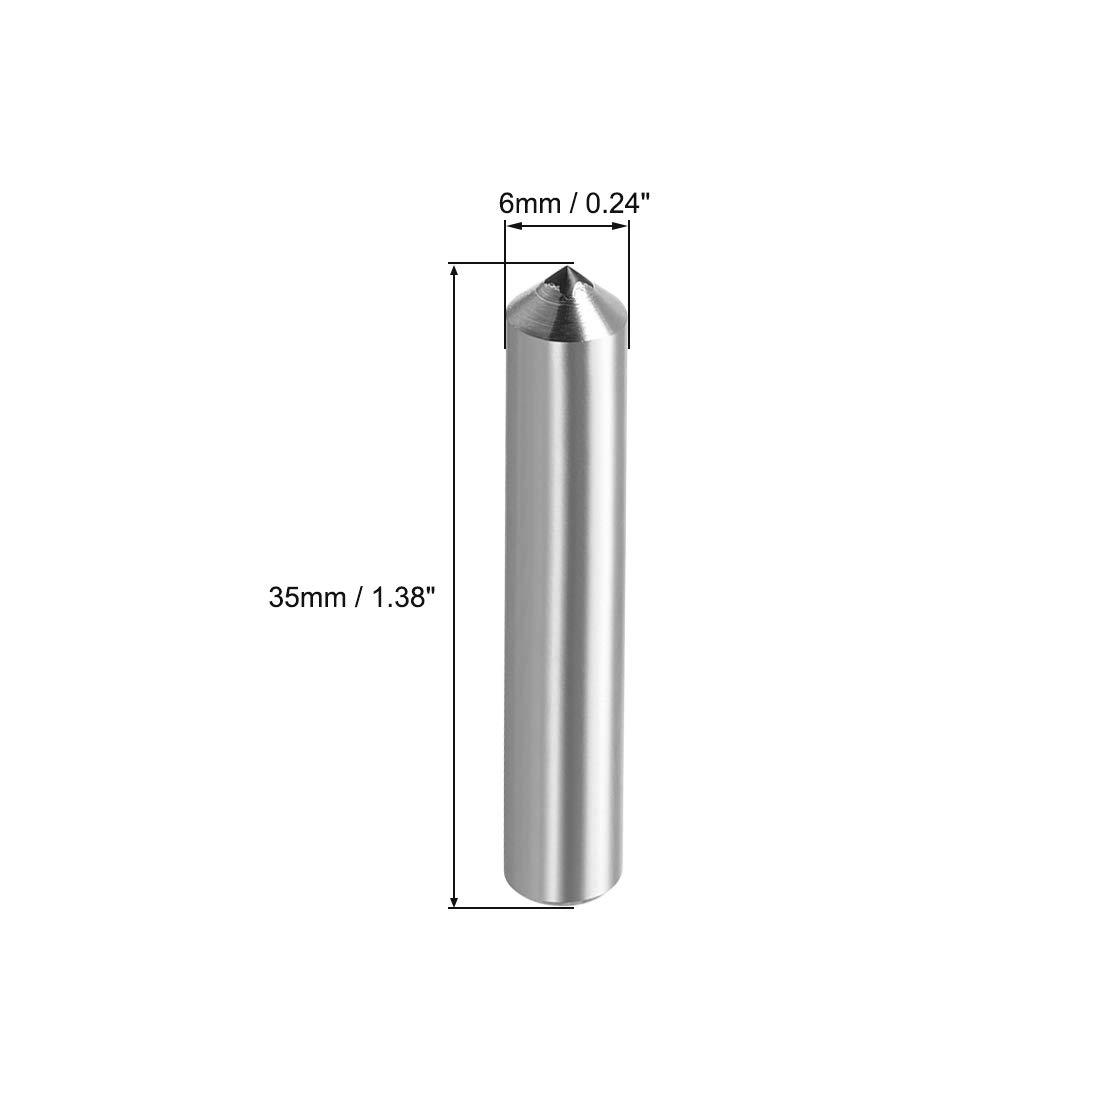 uxcell Diamond Grinding Wheel Dresser 12mm X 40mm Single Point Dressing Tool for Truing